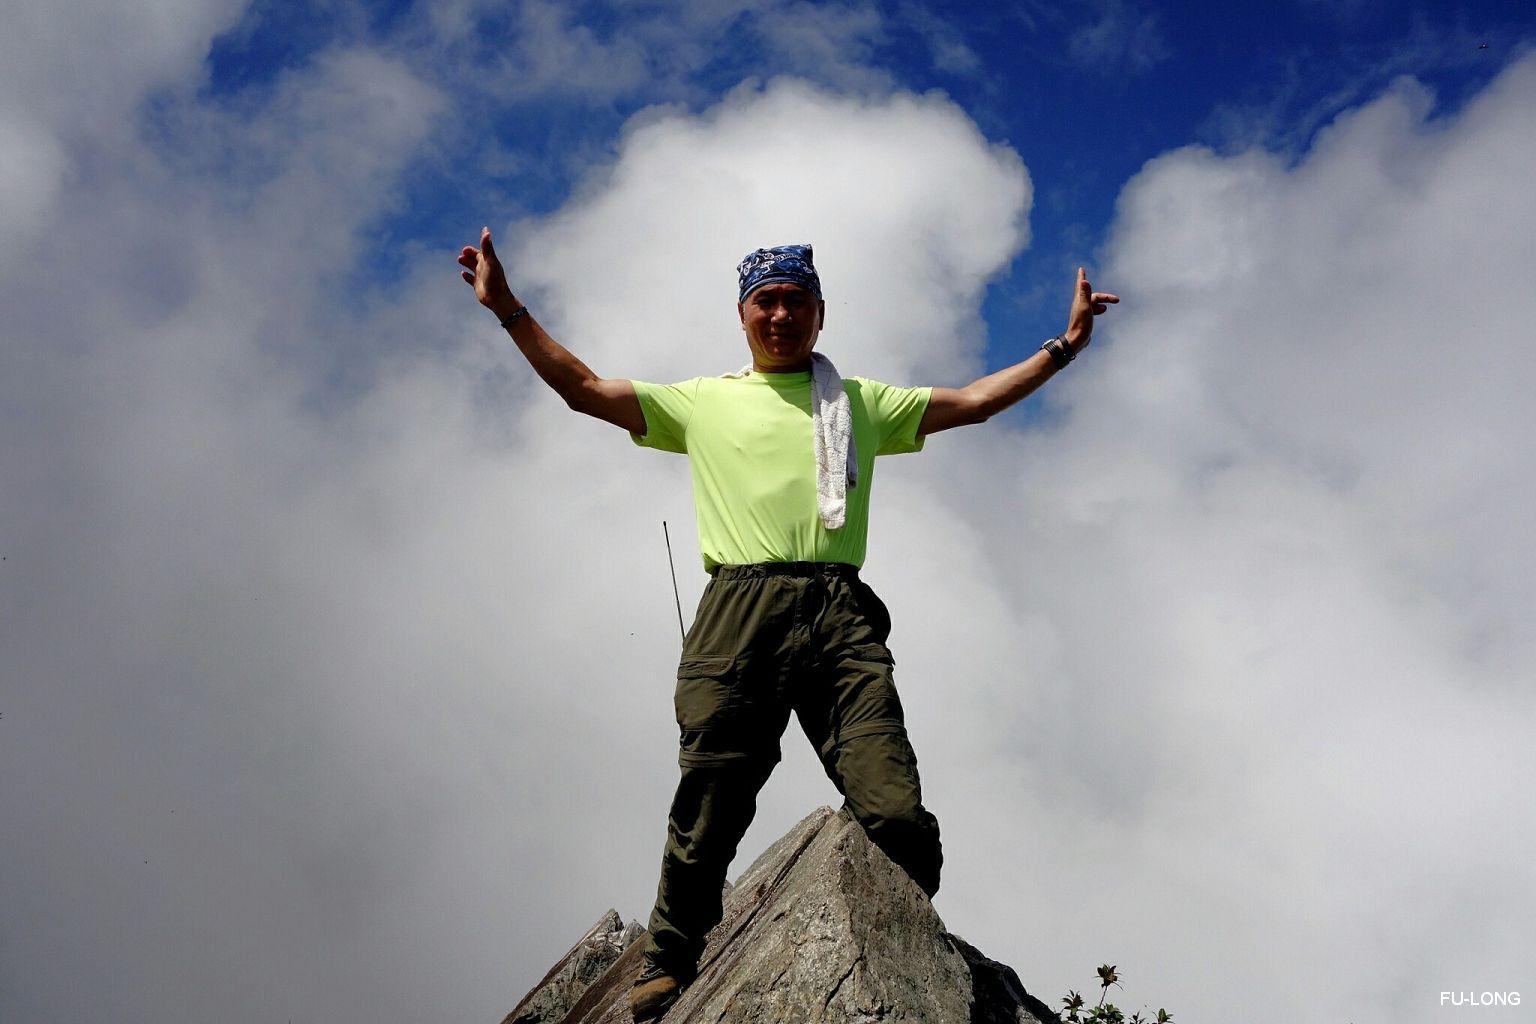 proimages/2016-08-20_Eagle_Mt_climbing/07_Eagle_mt.-topking.jpg